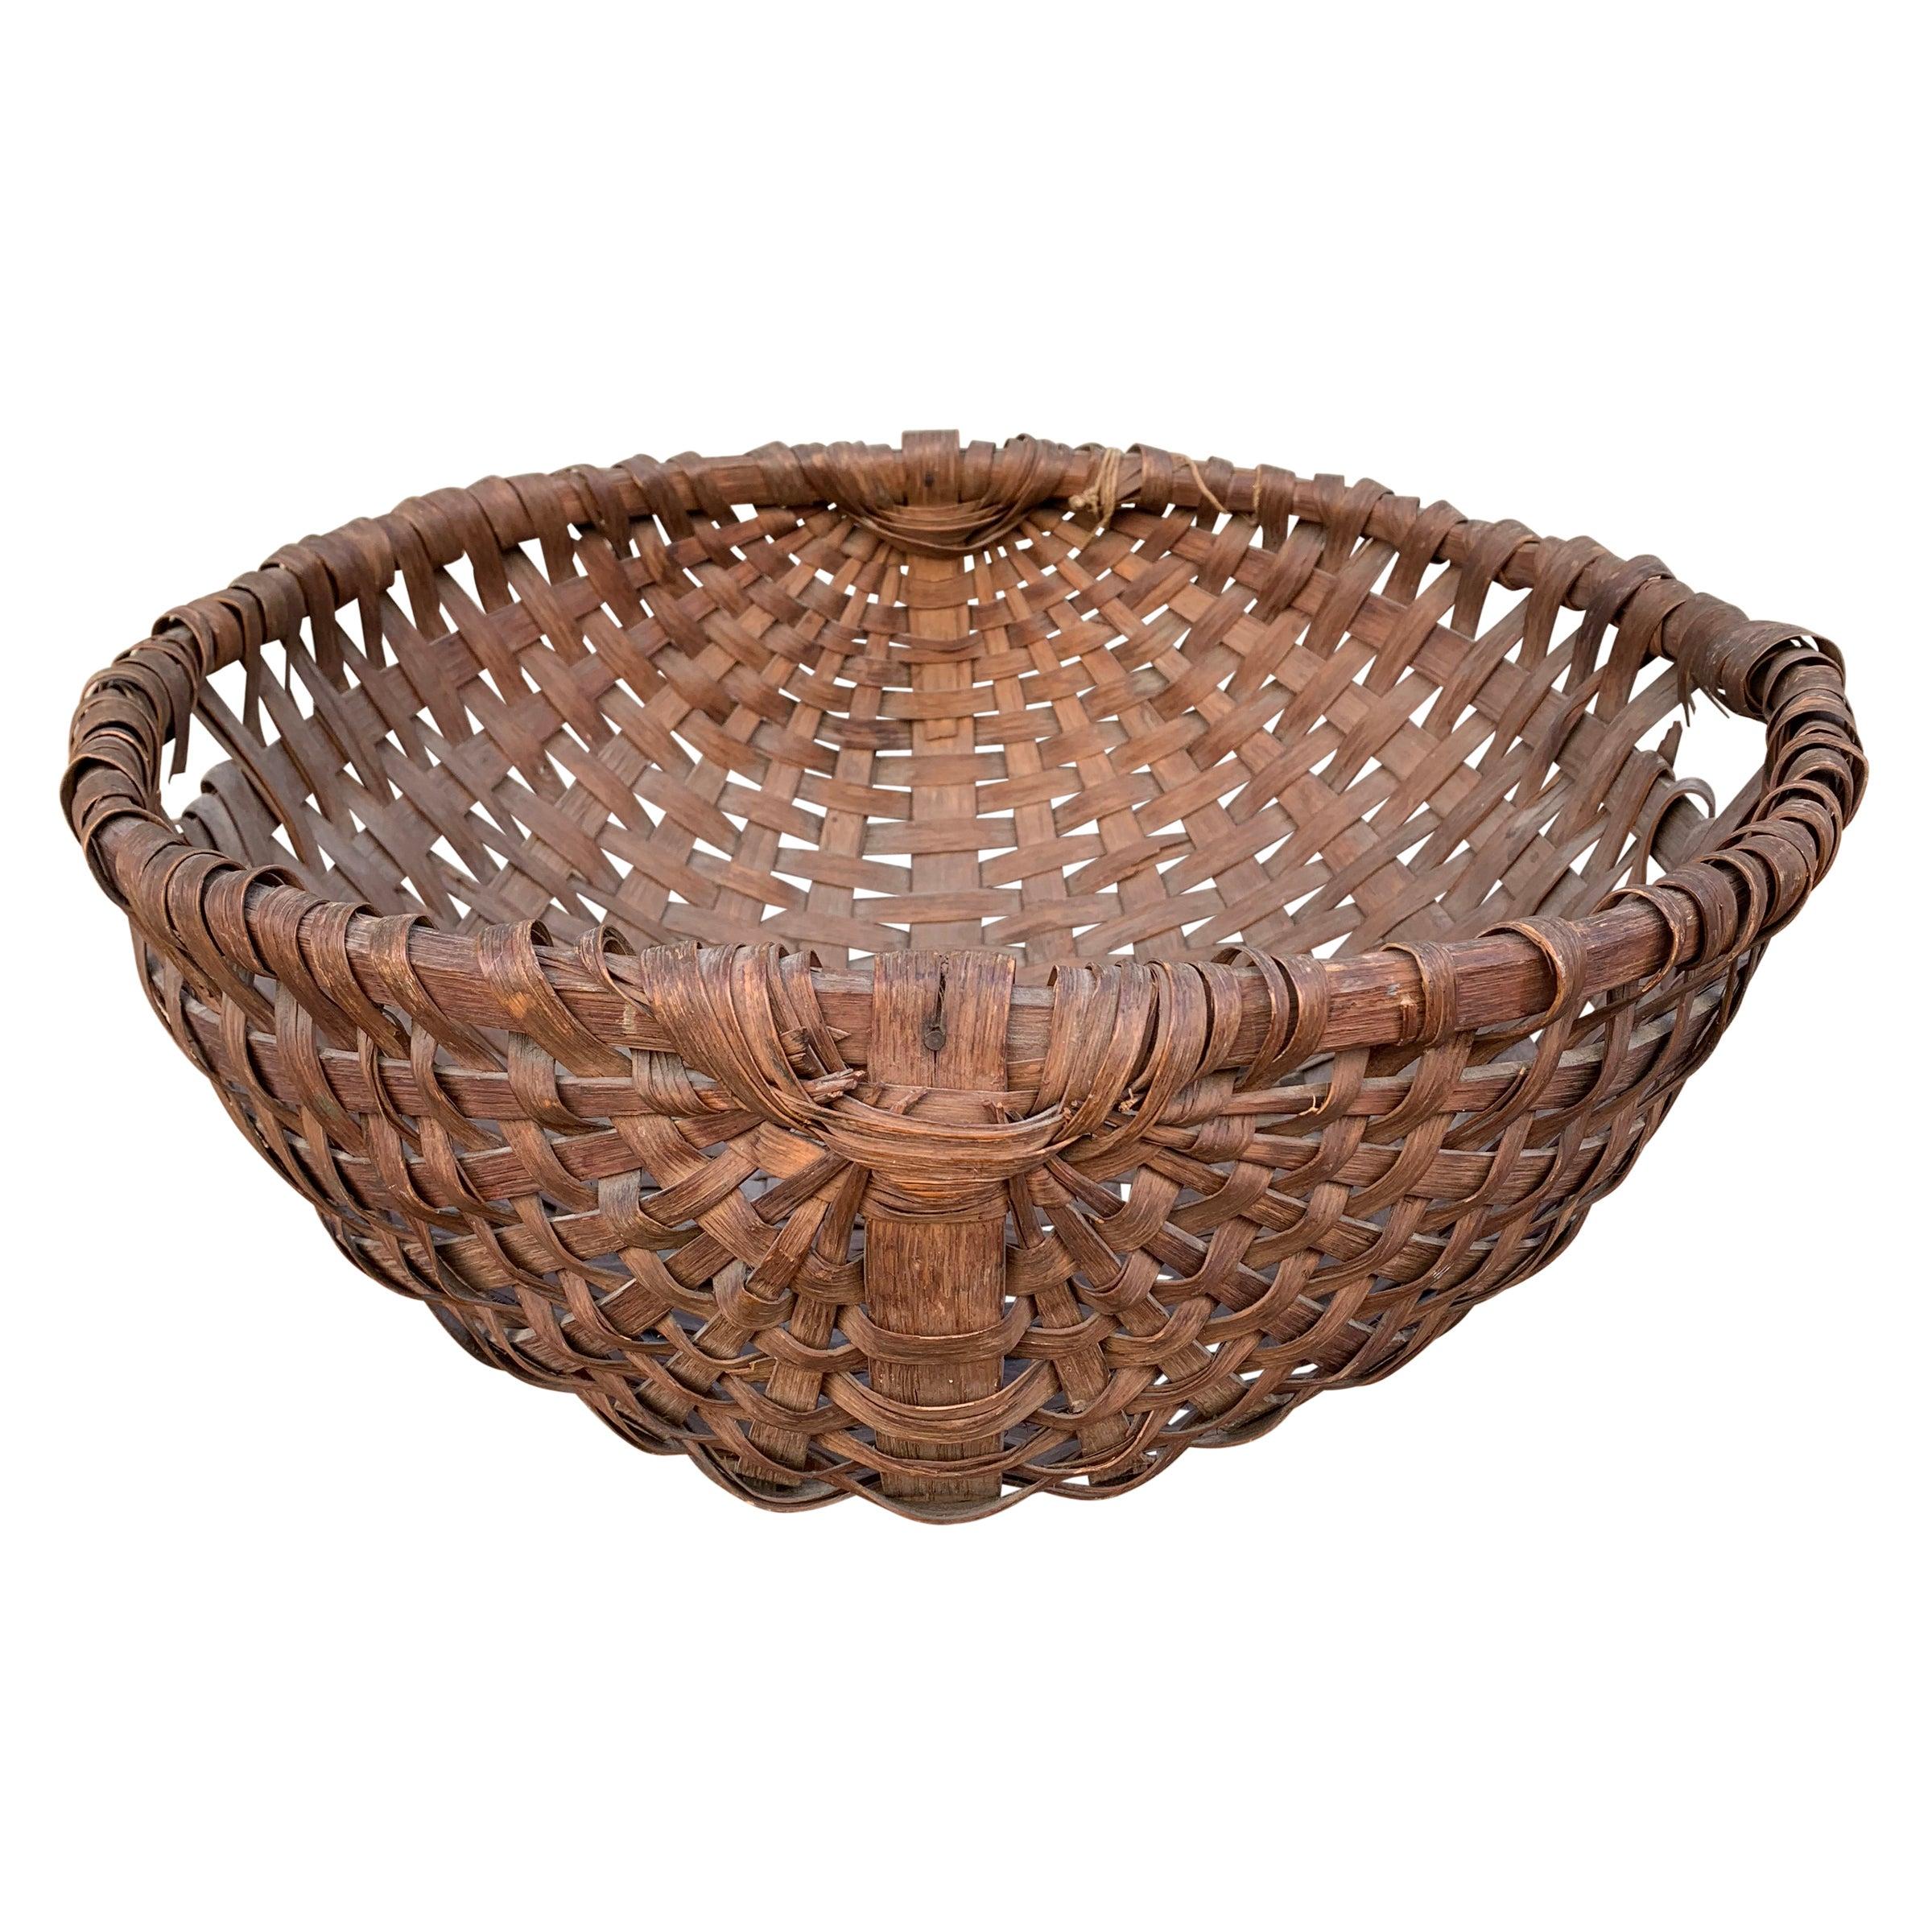 Large 19th Century American Spale Gathering Basket